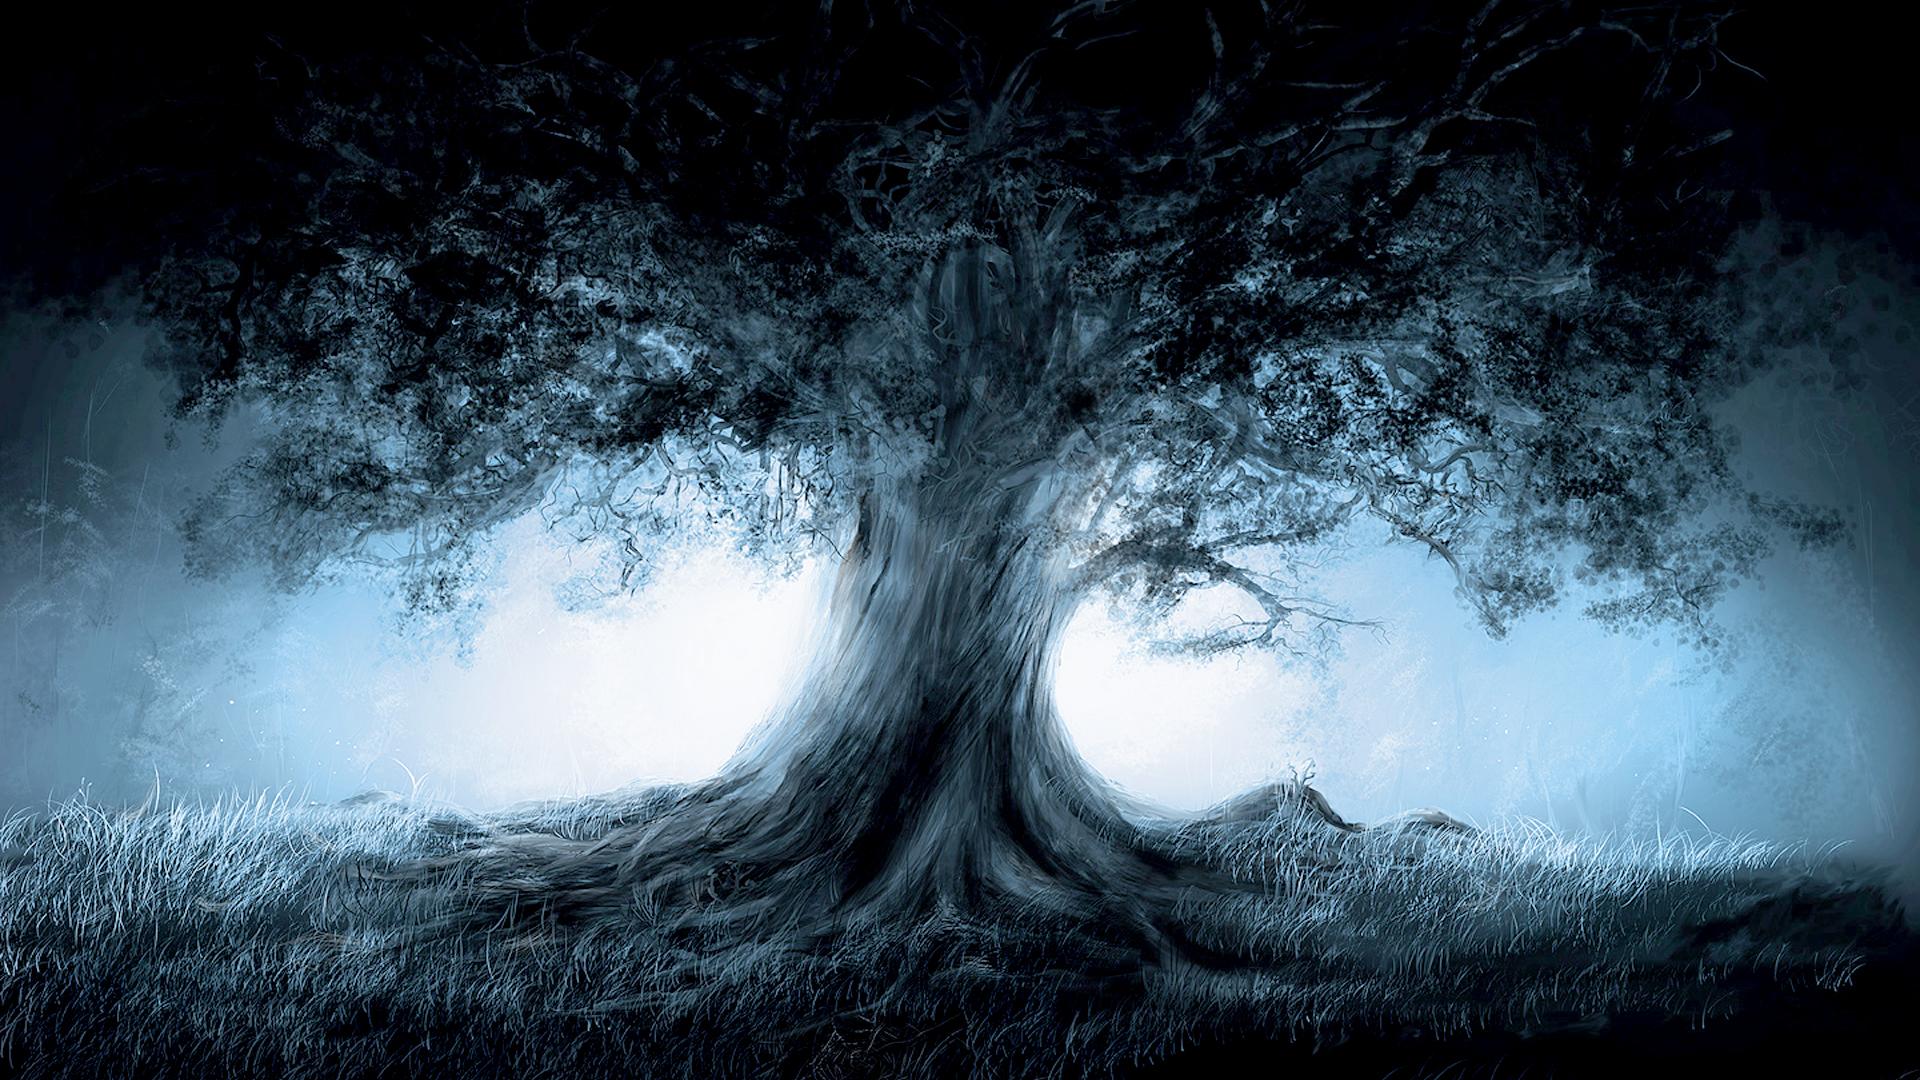 Fantasy Magic Tree Art HD Wallpapers 1920x1080